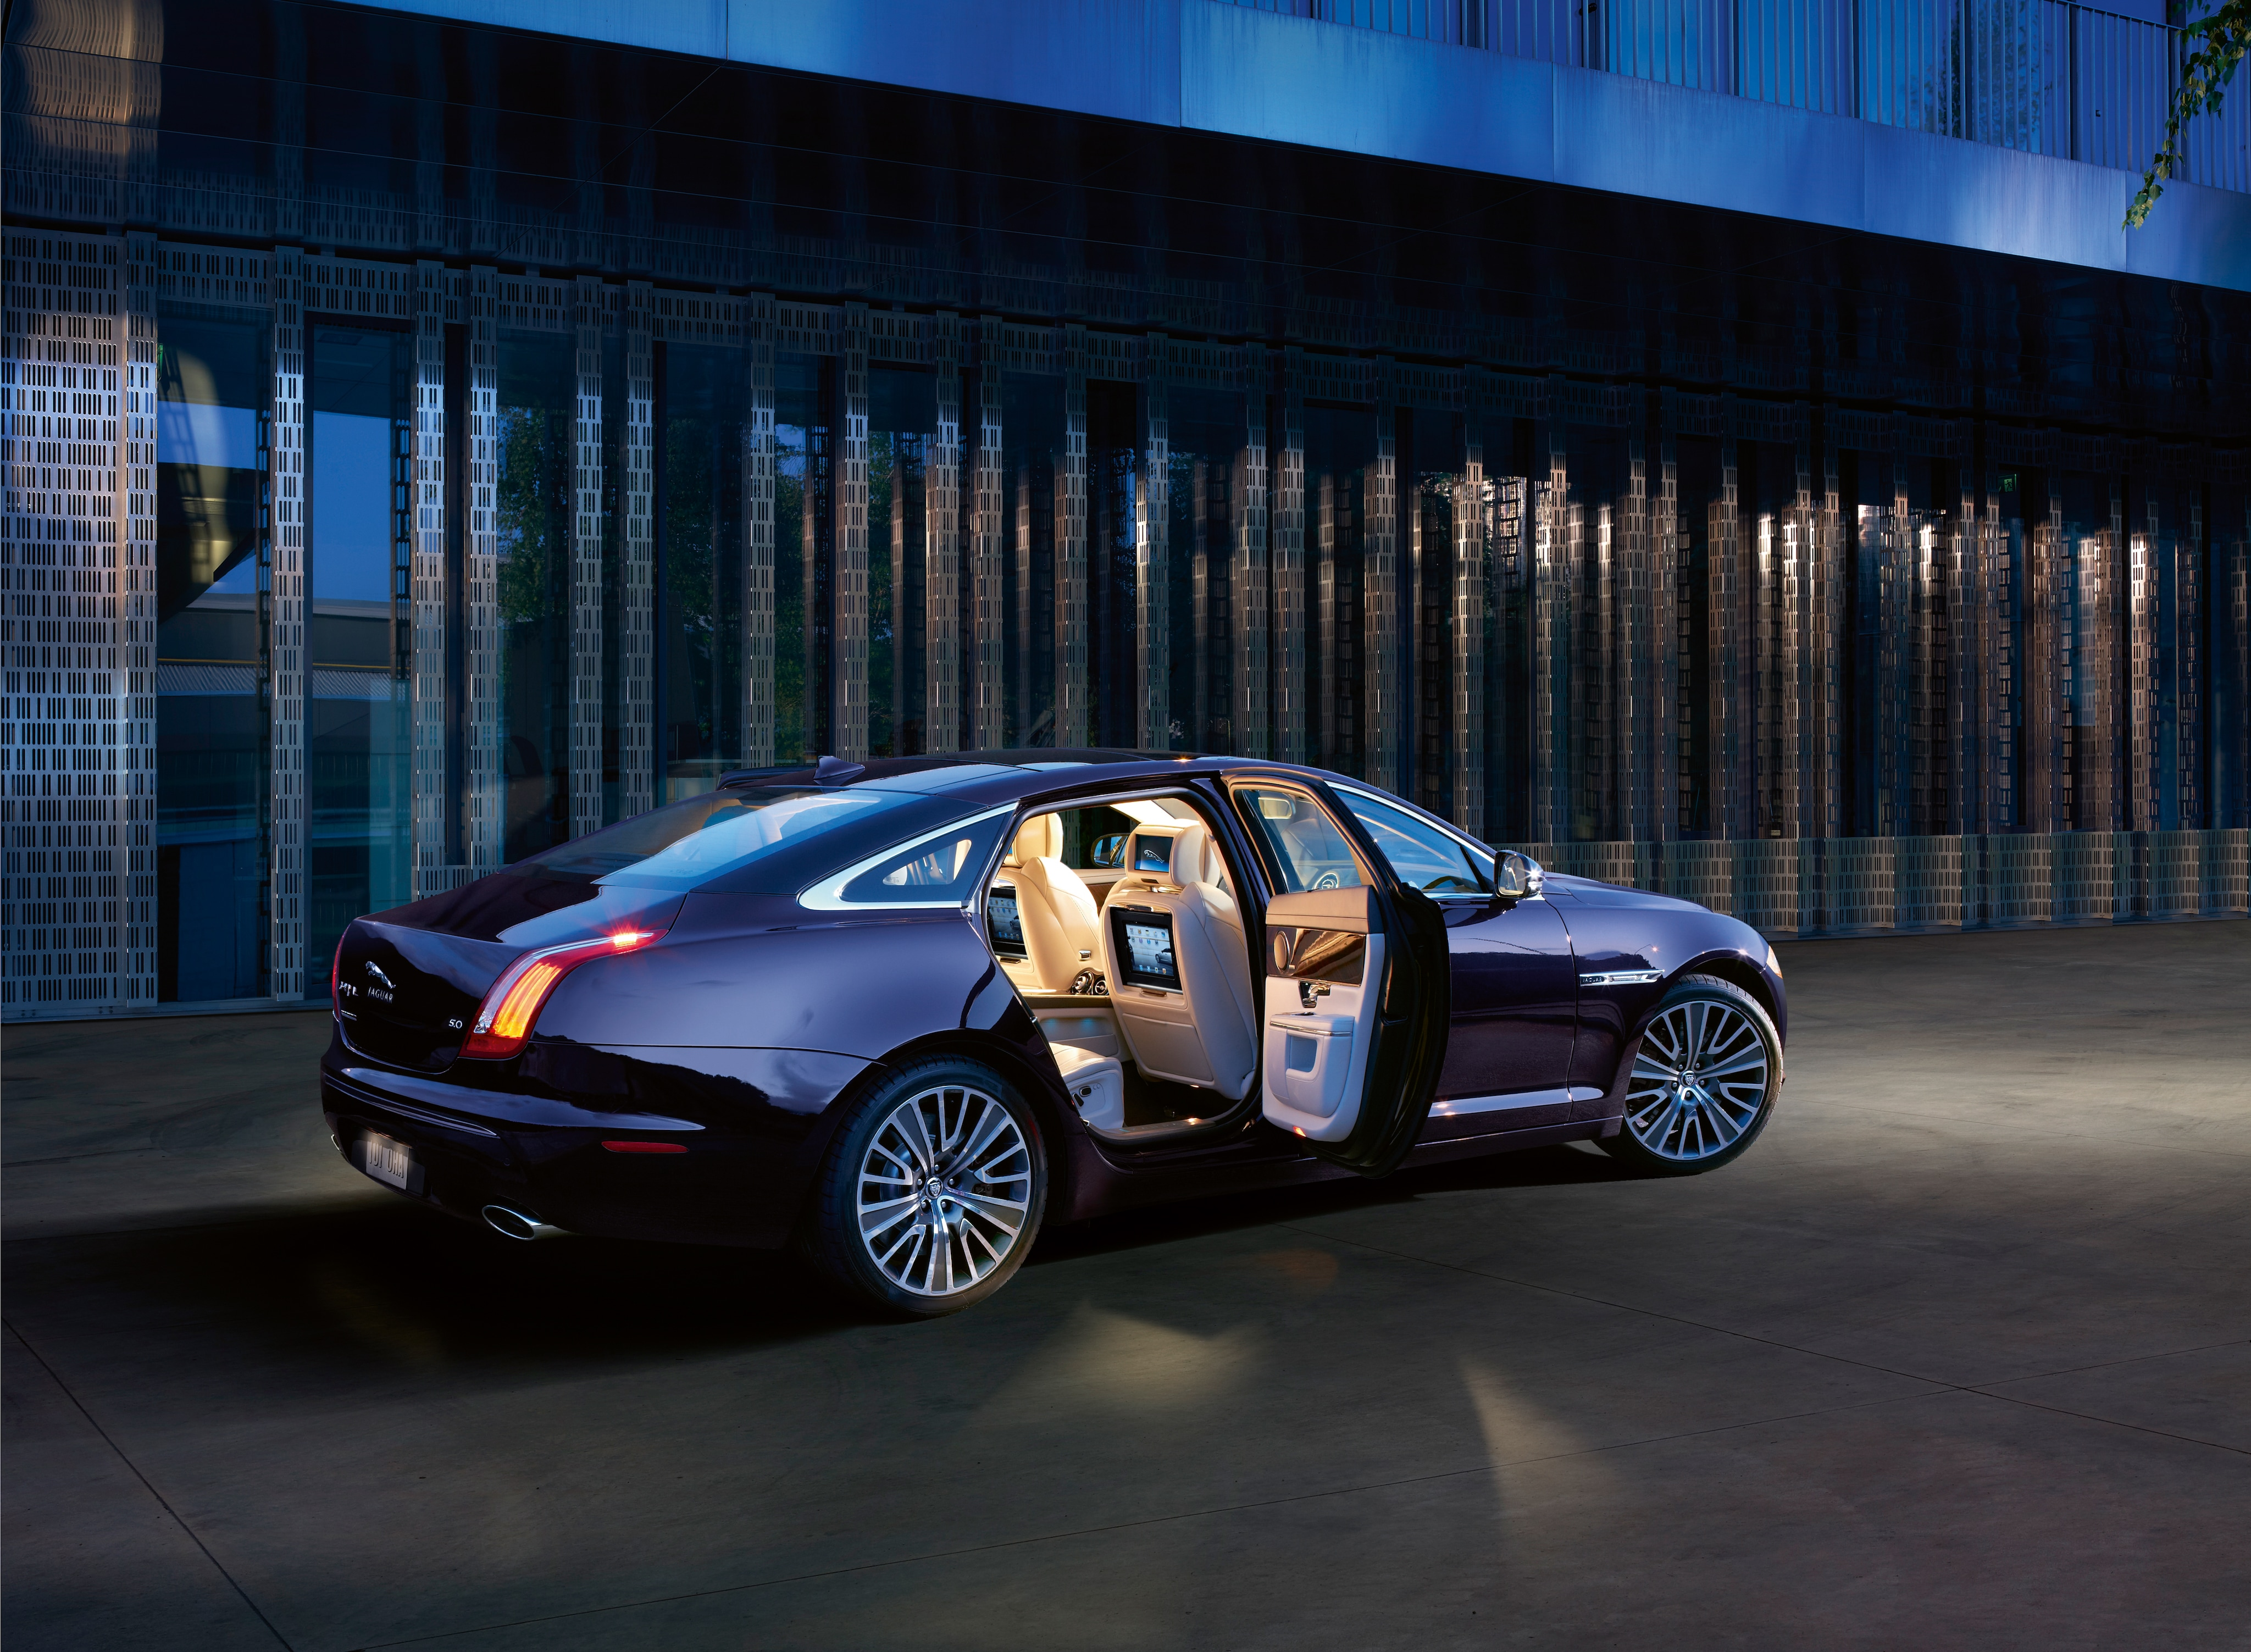 slk jaguar f mycarlady click competition convertible tt tramps roadster type